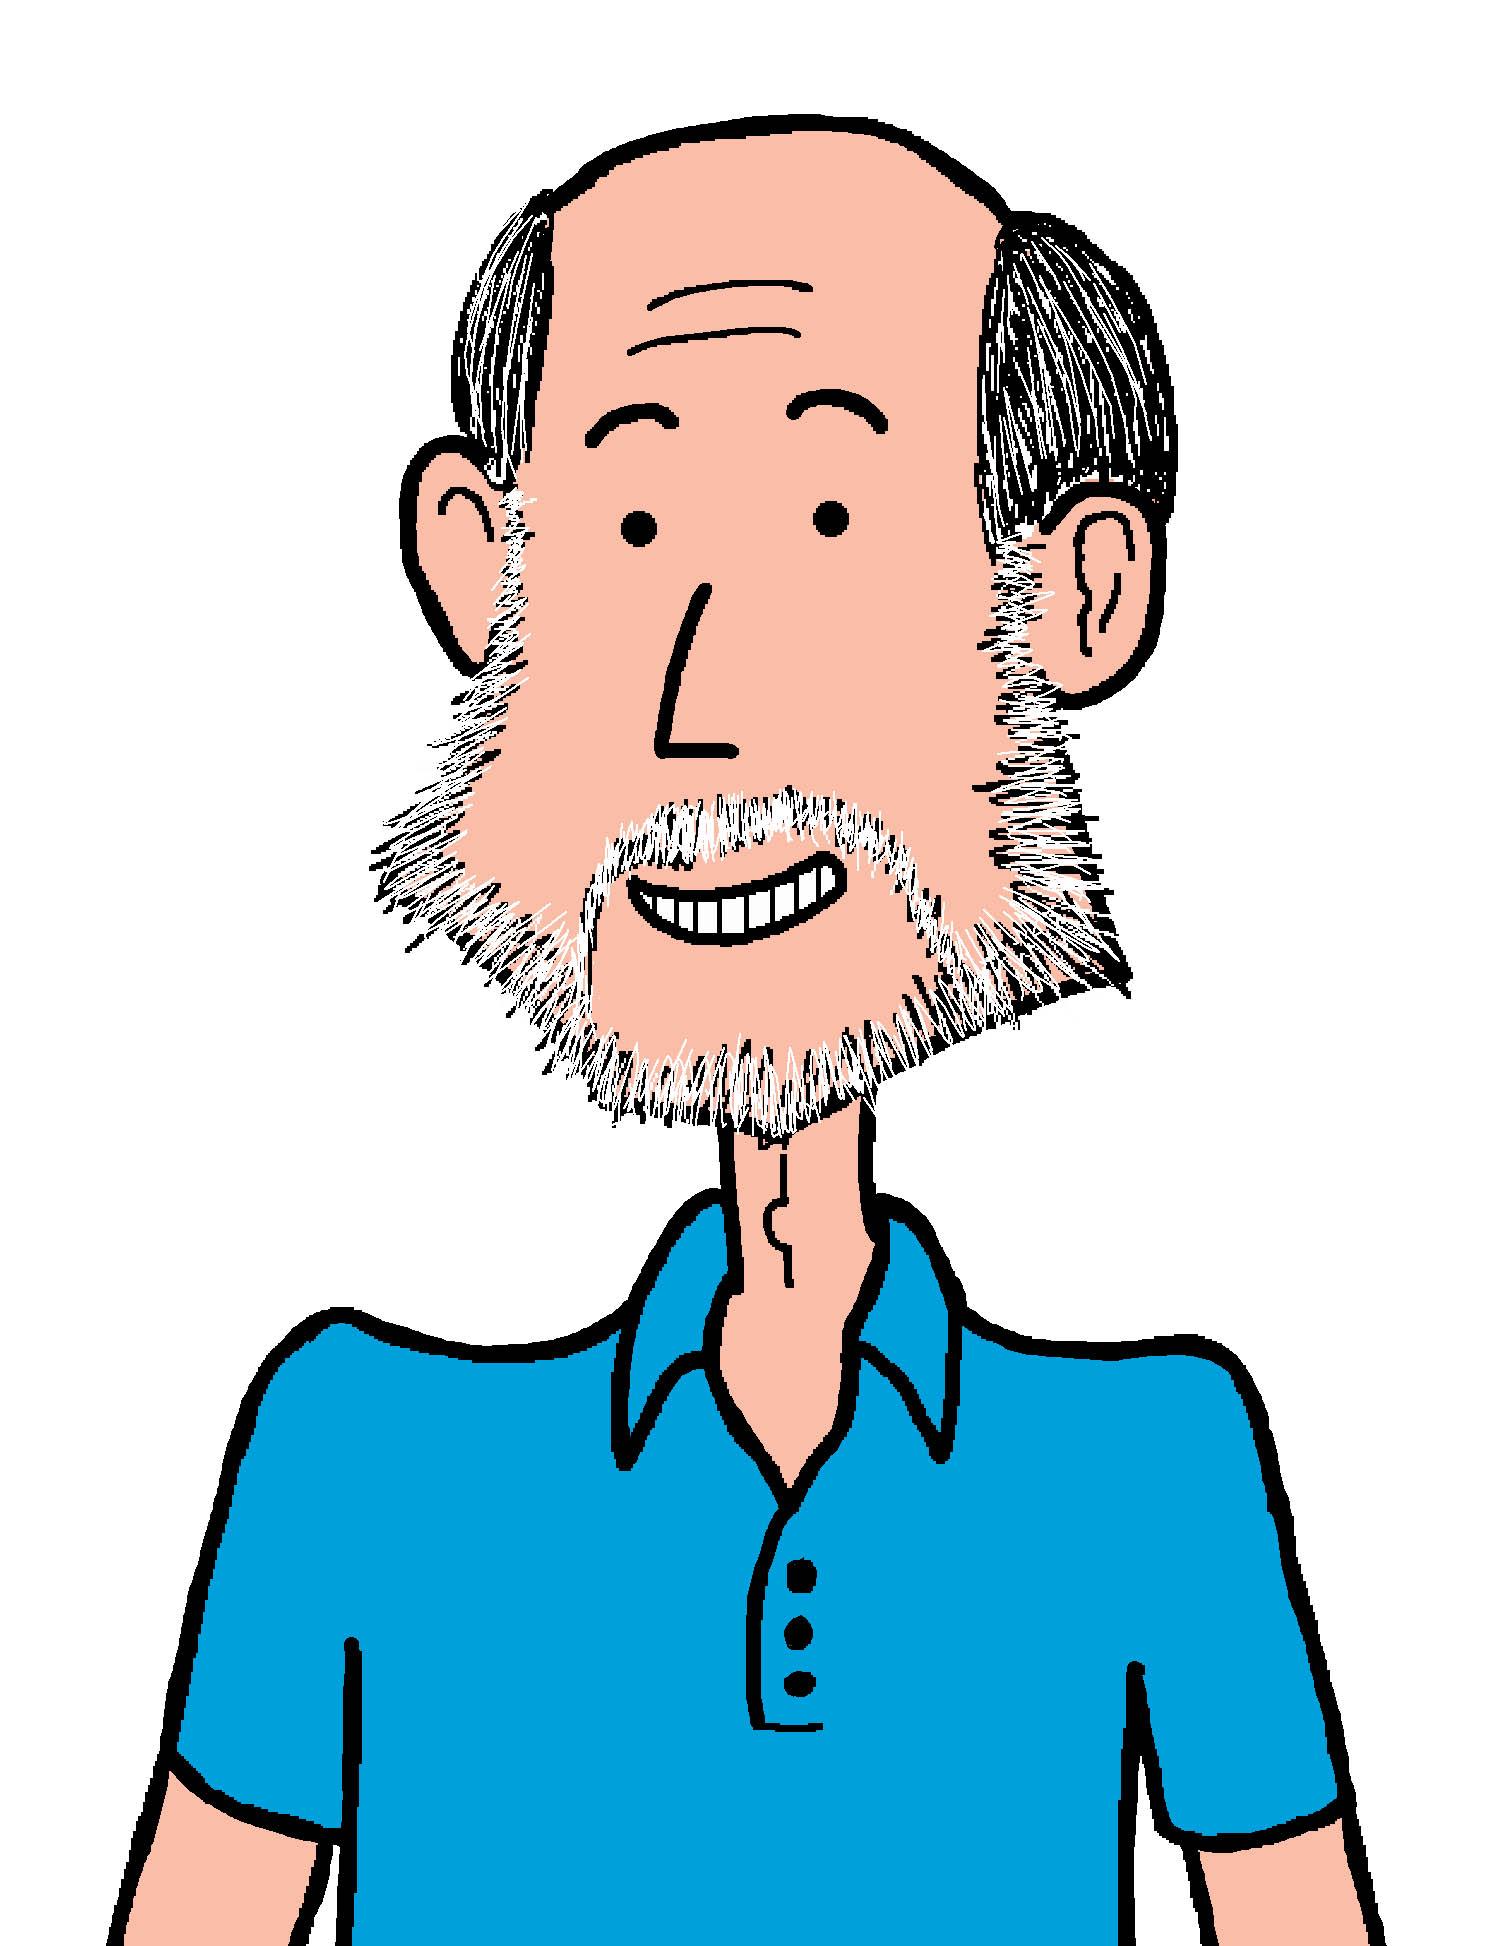 The Cartoonist's Shop Logo